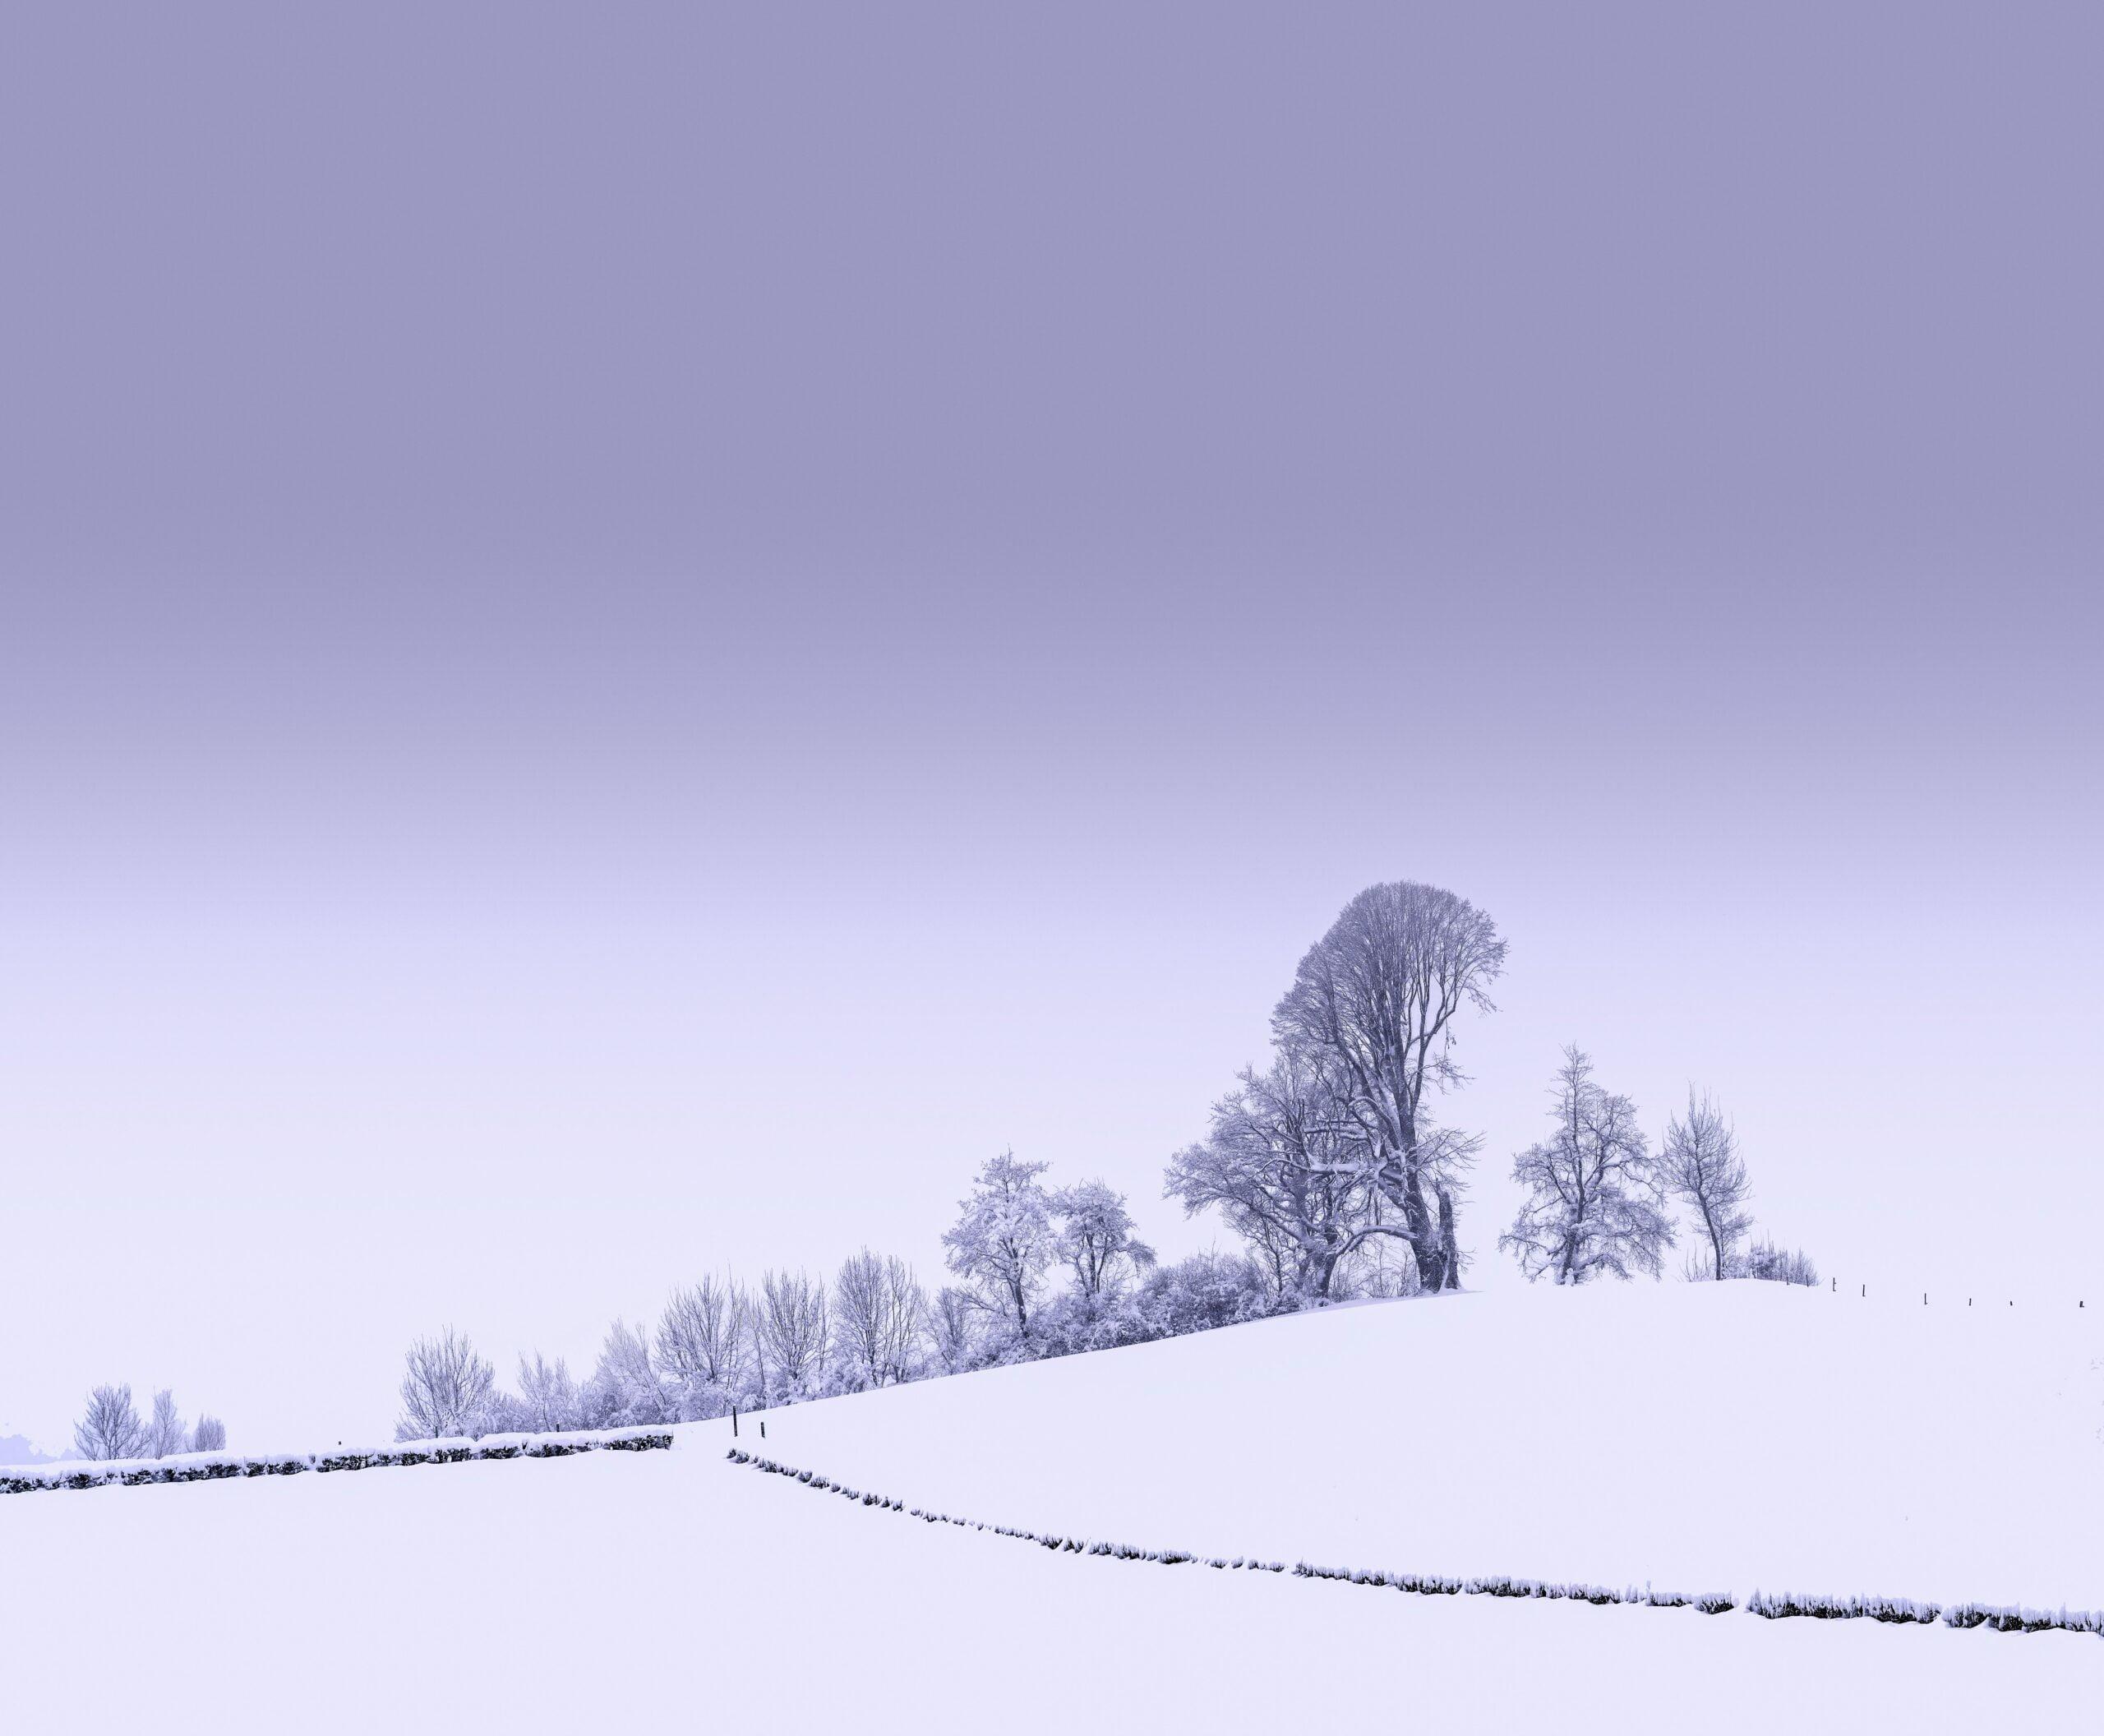 Landscape wallpapers